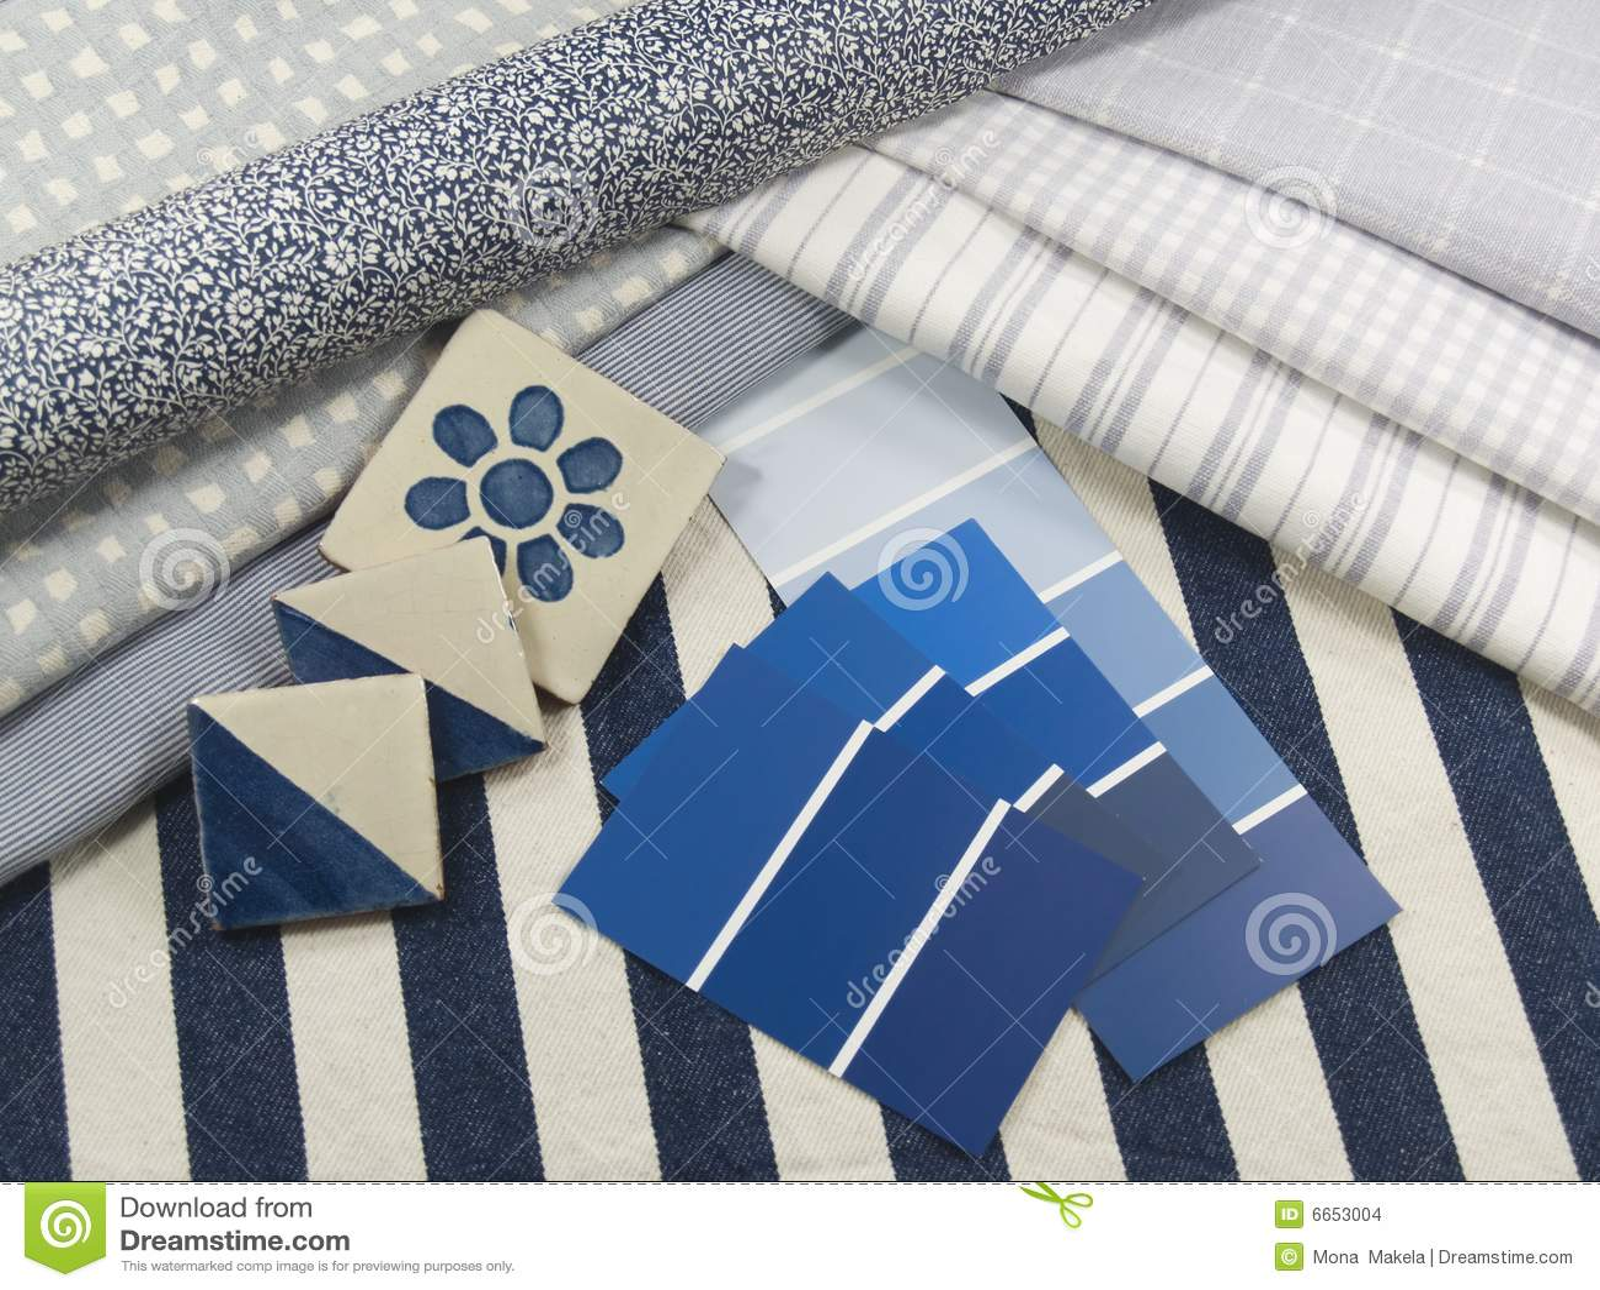 Blue and white interior design plan